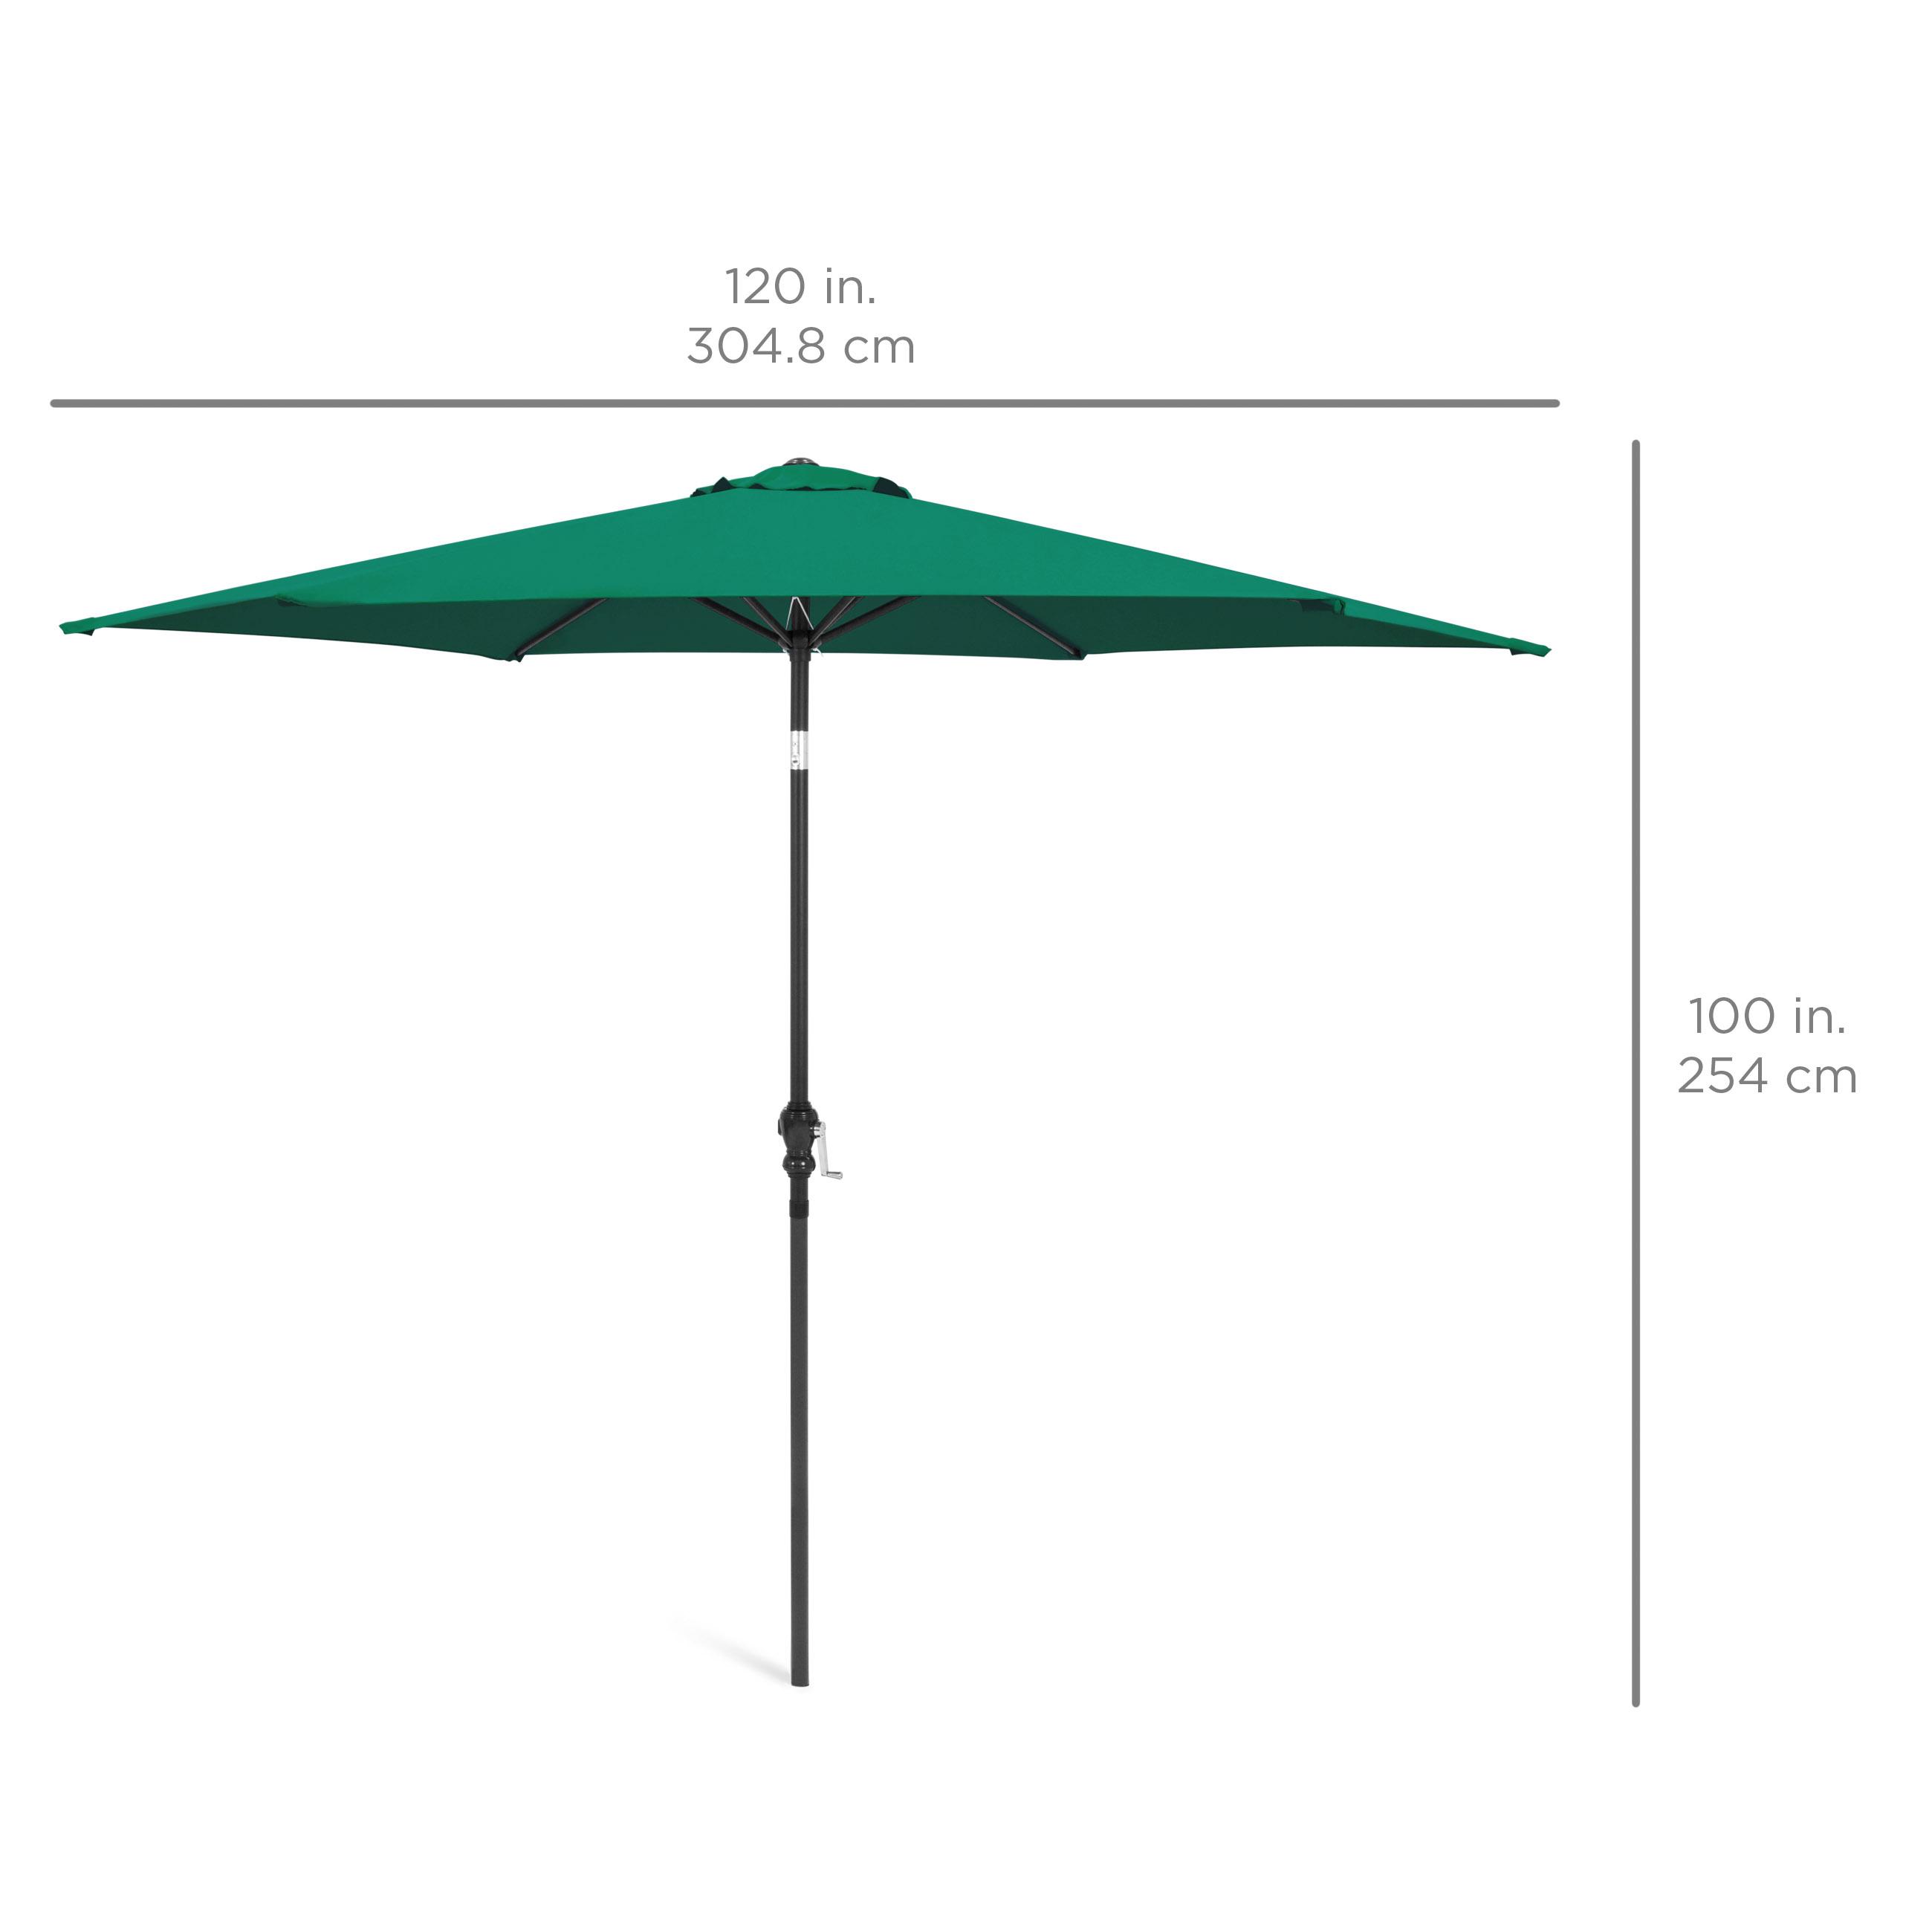 BCP-10ft-Outdoor-Steel-Market-Patio-Umbrella-Decoration-w-Tilt-Crank thumbnail 42